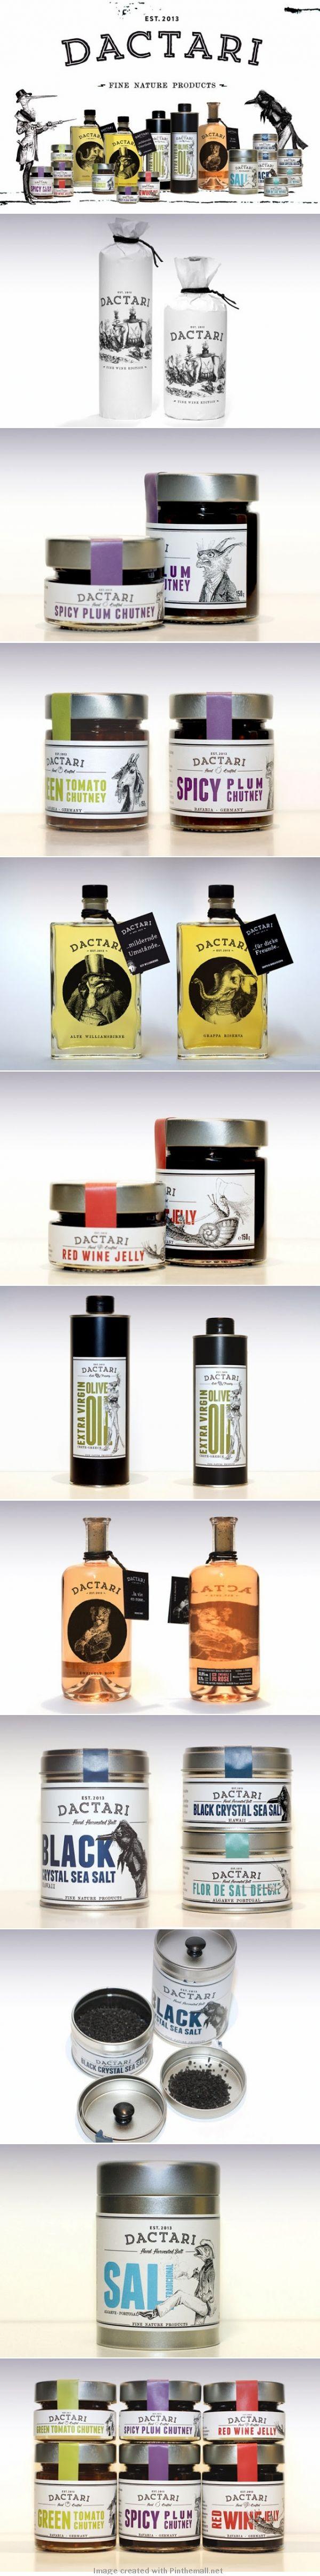 Dactari Fine Nature Products Agency: DAC design am chiemsee Designer: Anne Stilper, Tim Hippmann Country: Germany PD